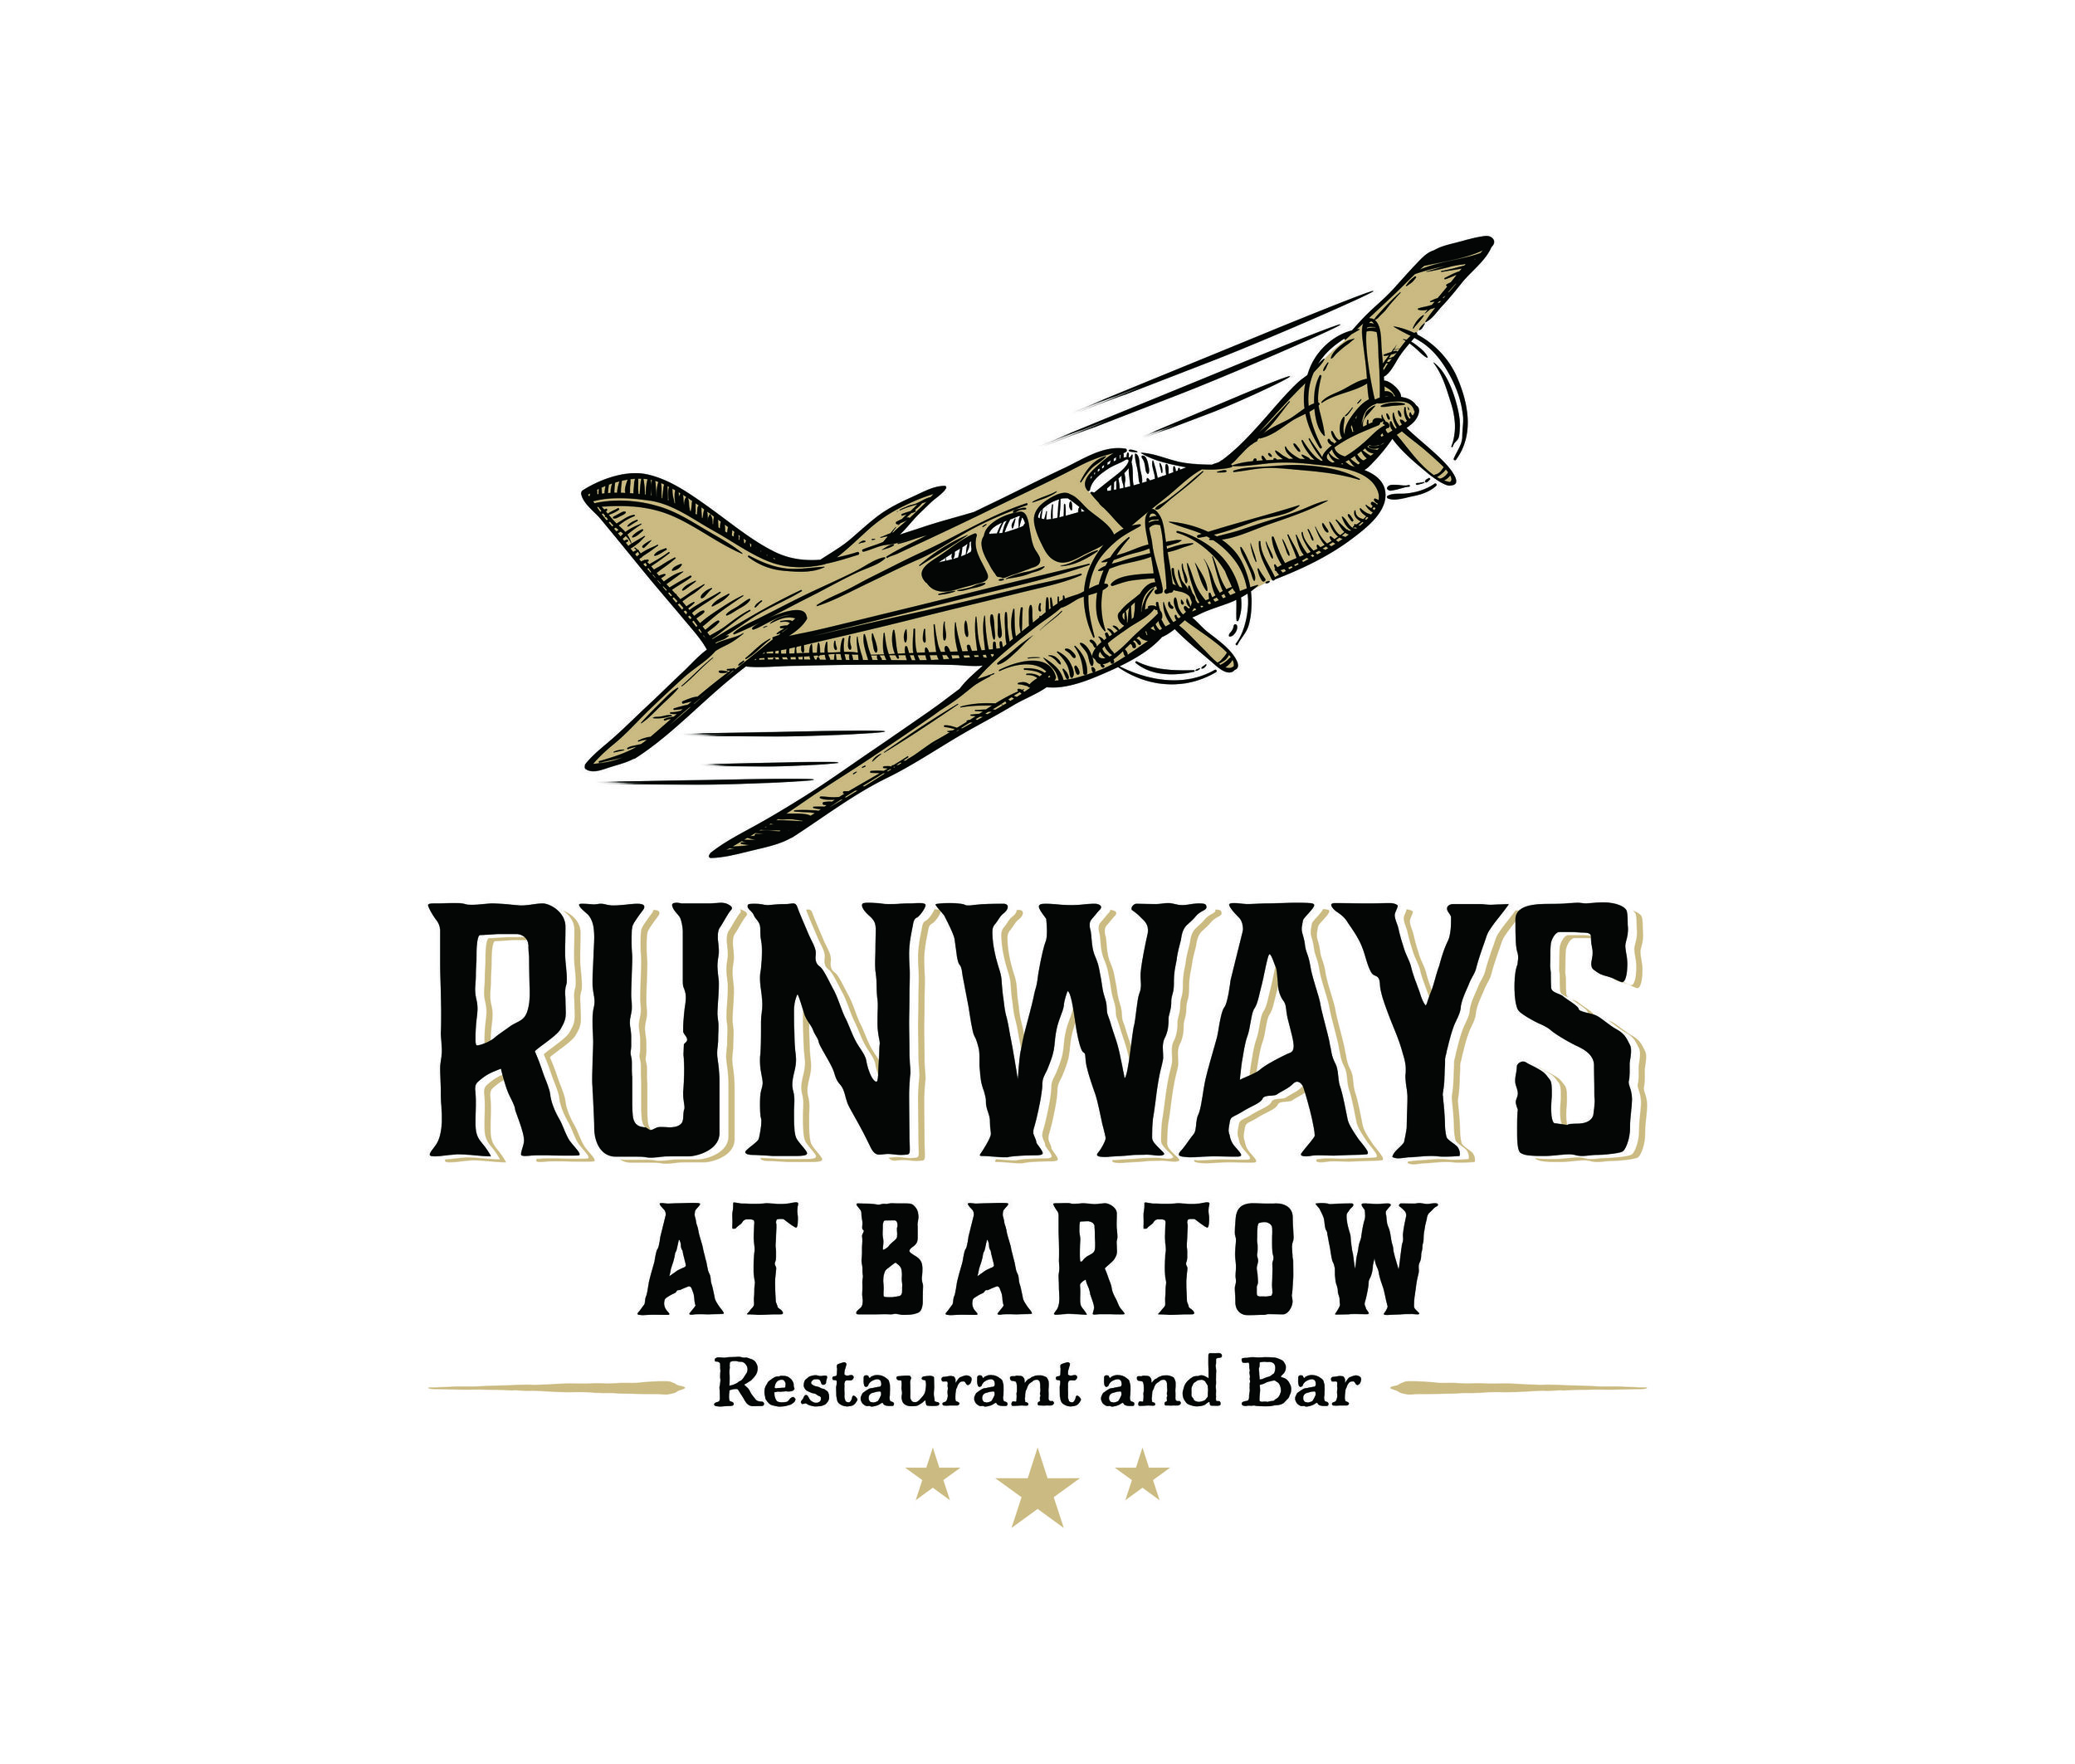 Runways-at-Bartow-1.jpg